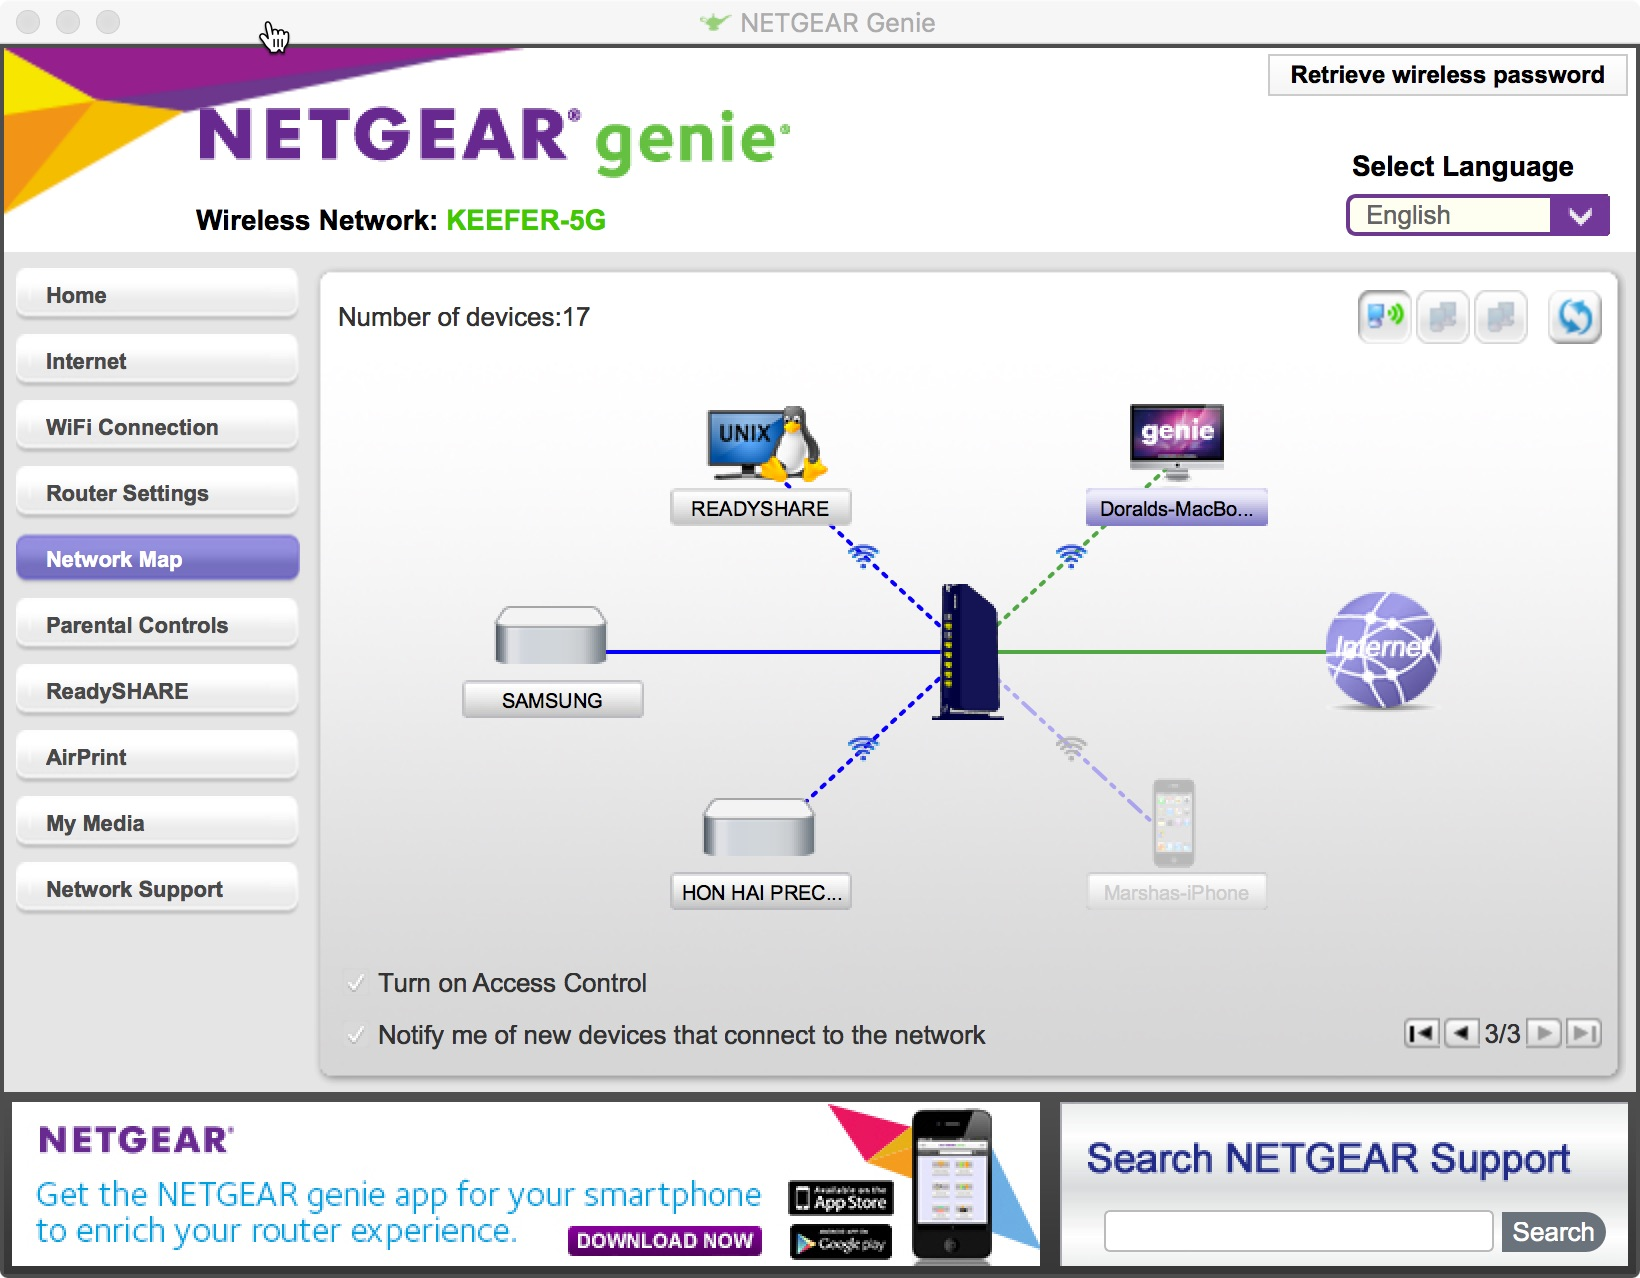 Solved: Netgear Genie - Network Map showing strange connec